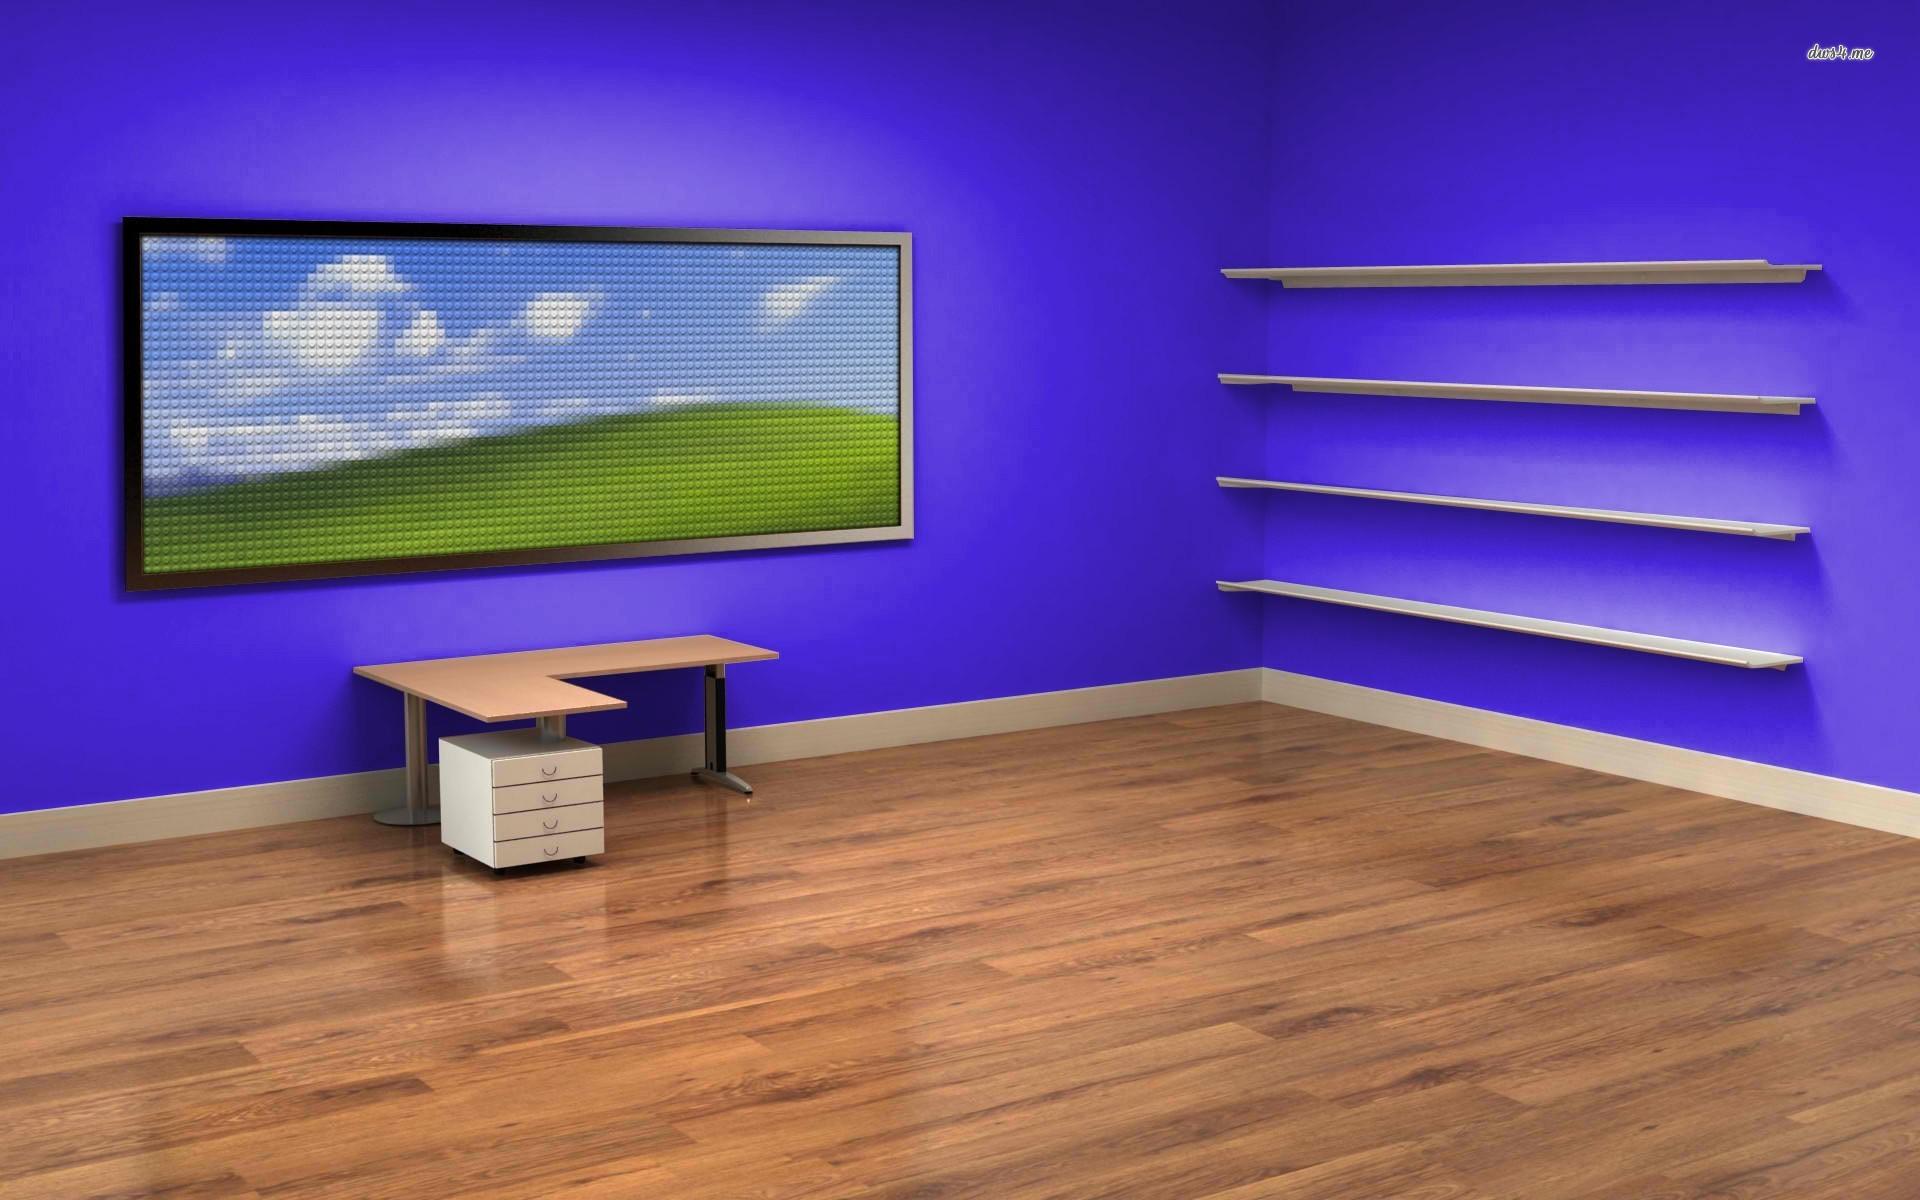 empty bookshelf wallpaper wallpapersafari. Black Bedroom Furniture Sets. Home Design Ideas